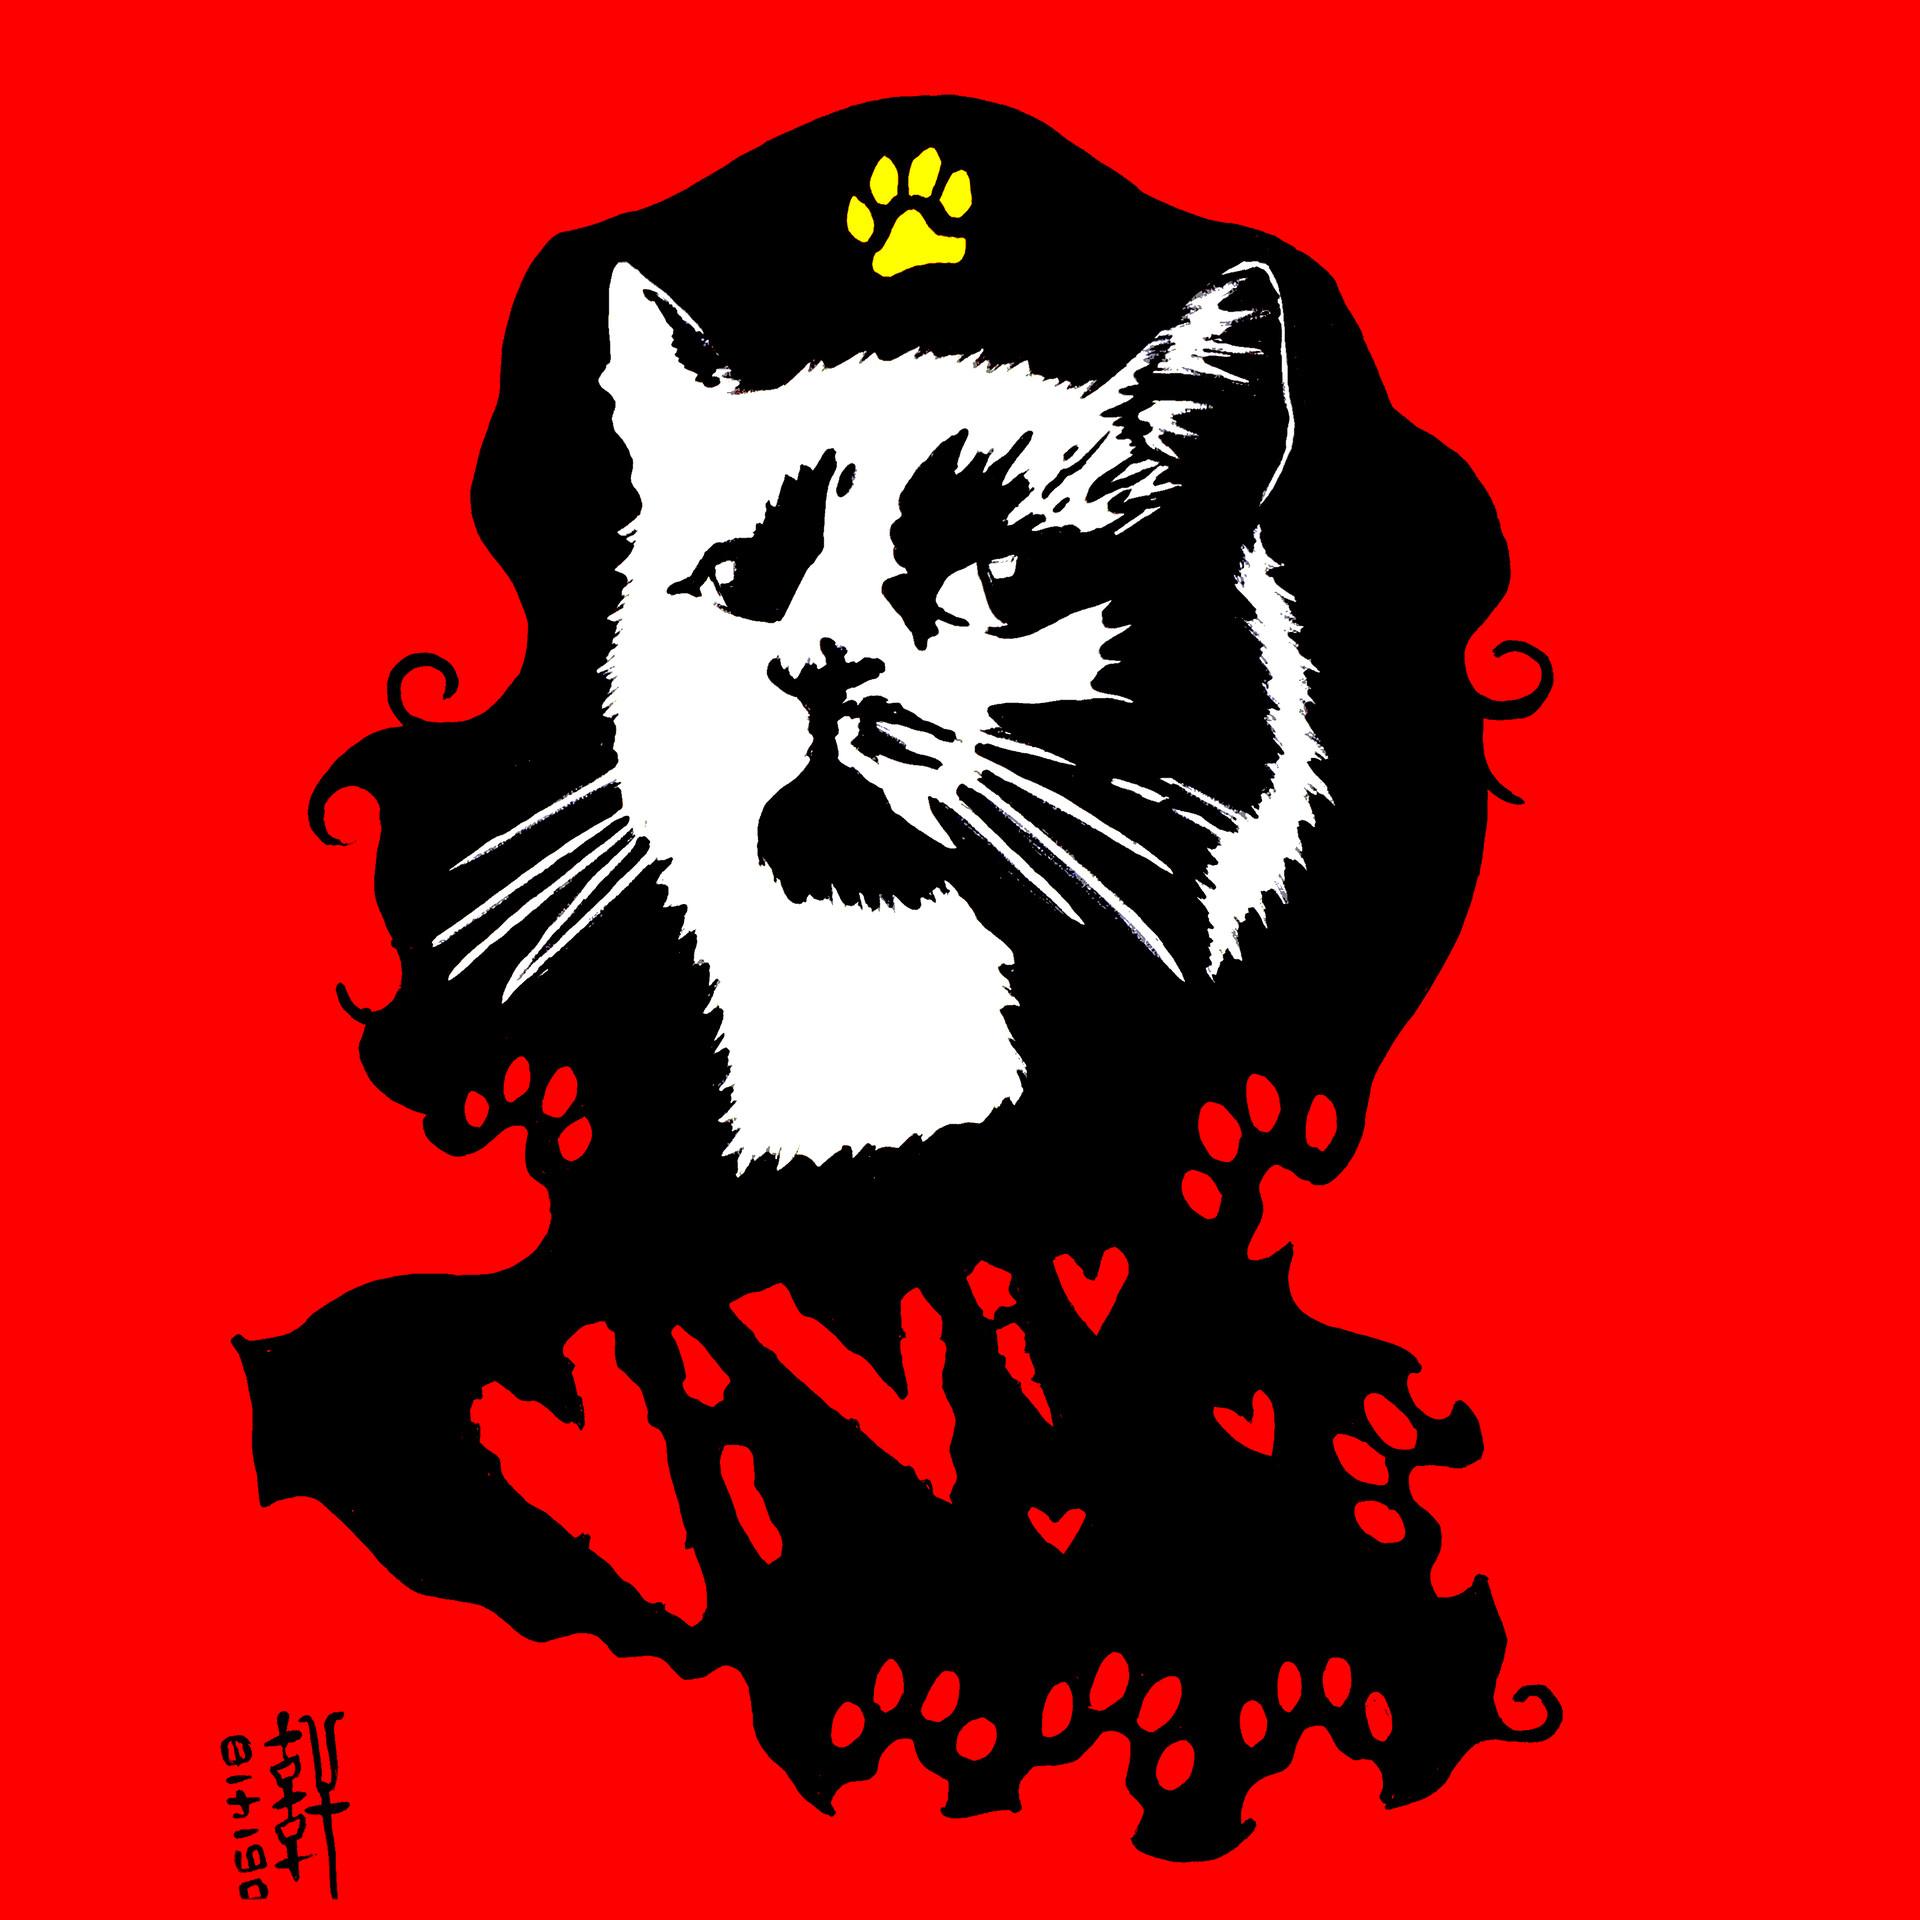 Day 06-14-18 - Cat Guevara